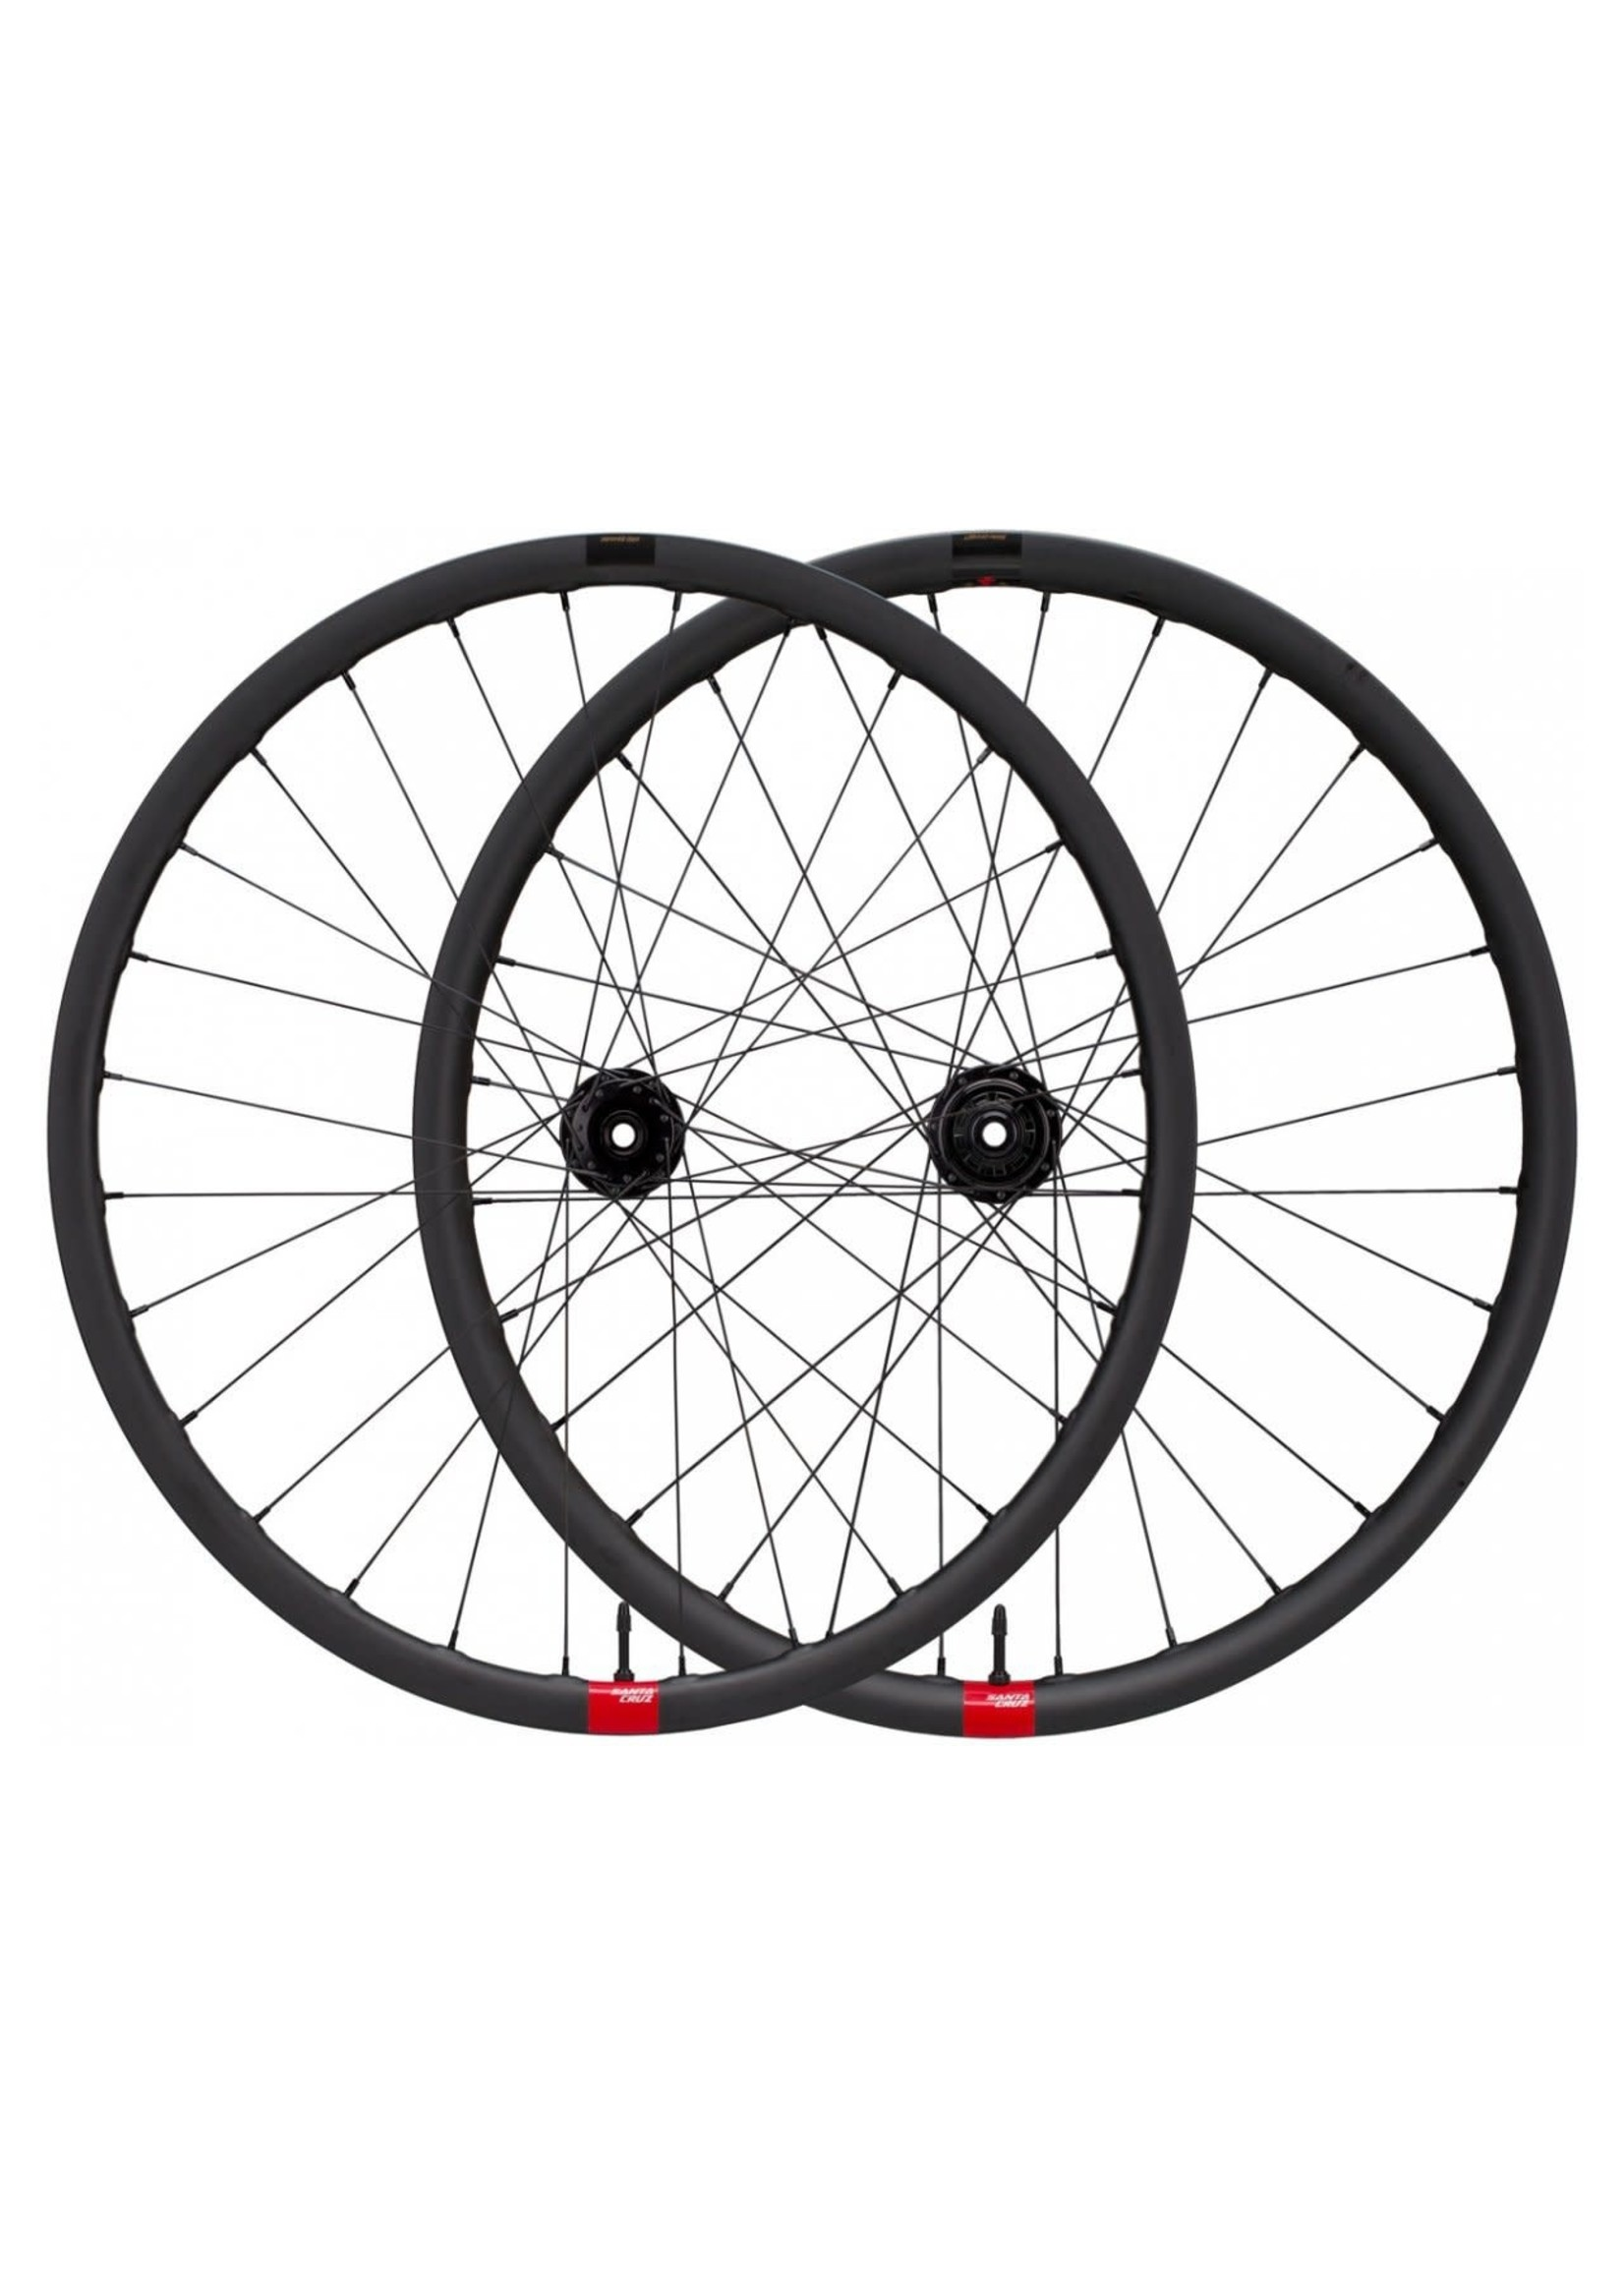 Santa Cruz Bicycles RESERVE 27.5 27 XD WHEELS, tires included